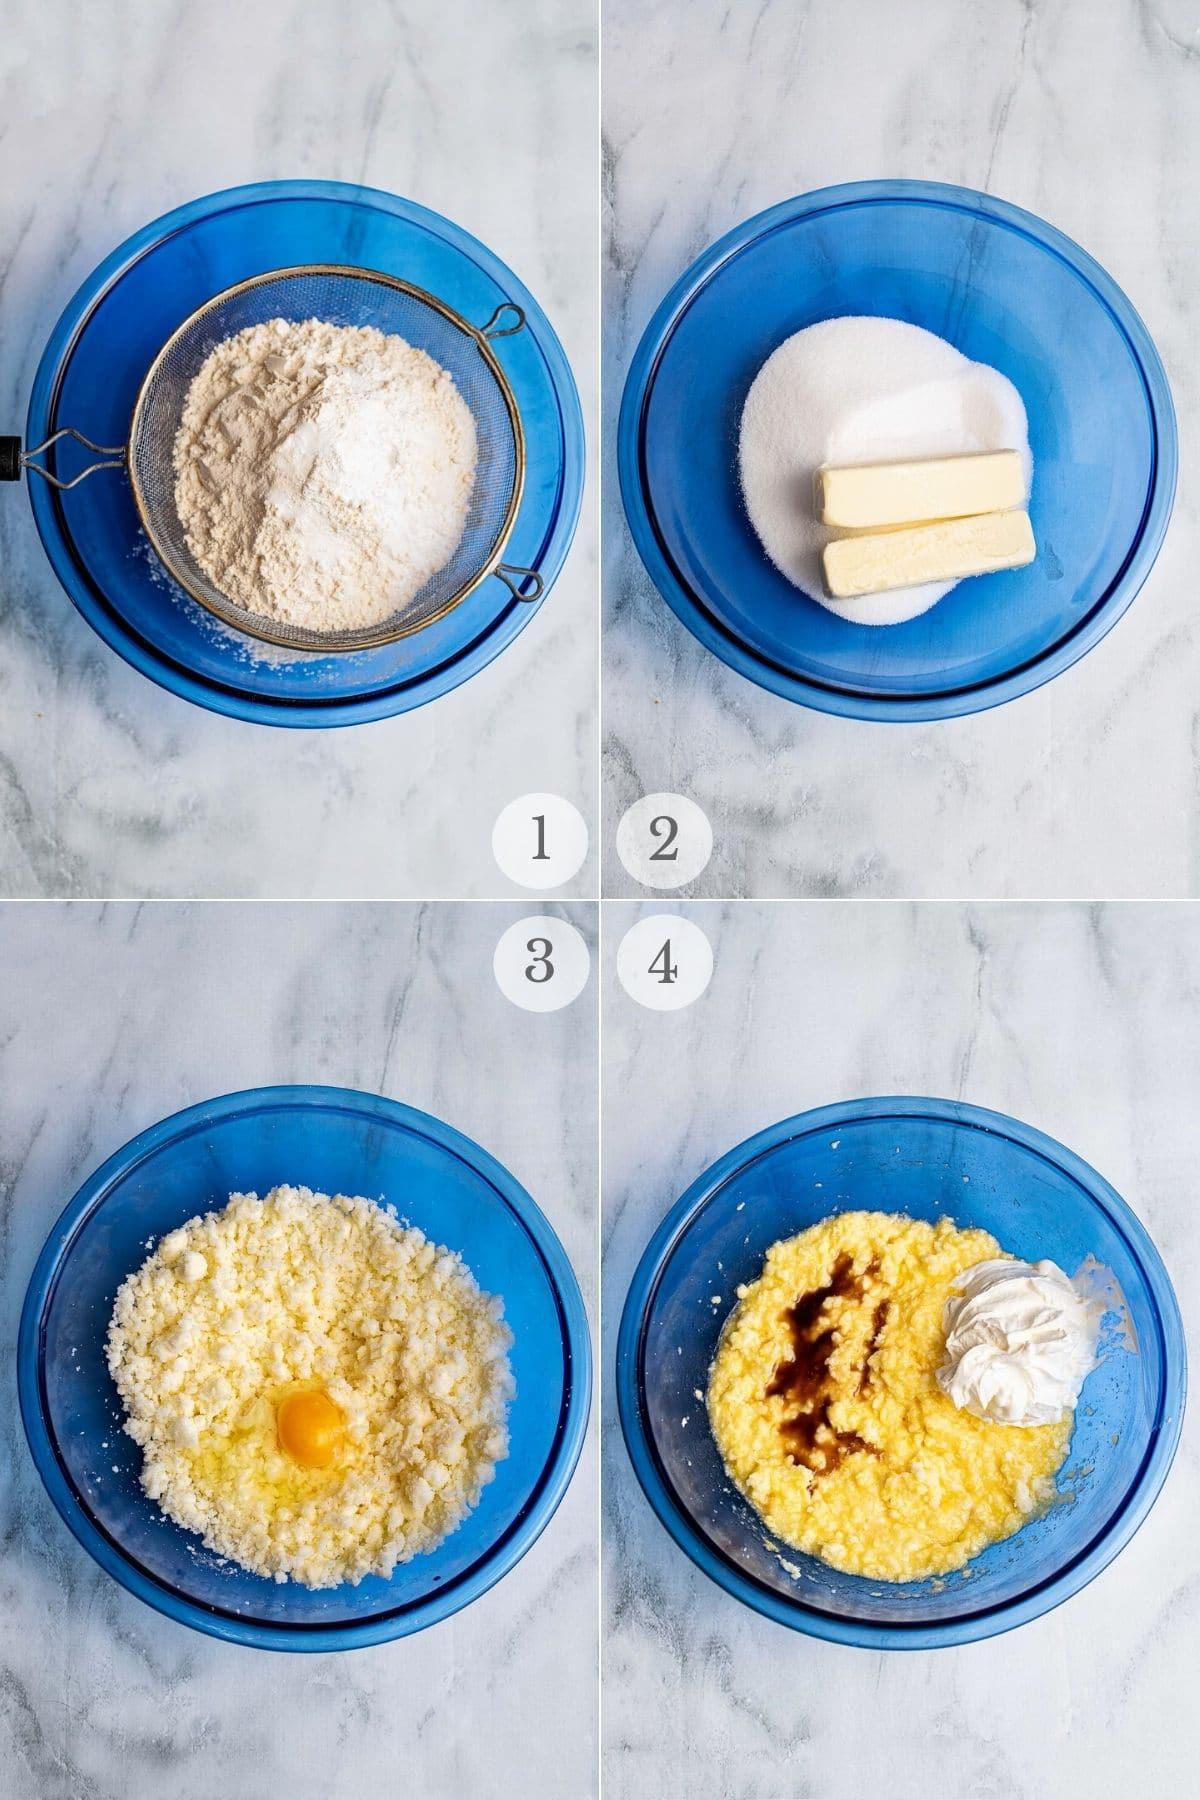 lofthouse cookies recipe steps 1-4